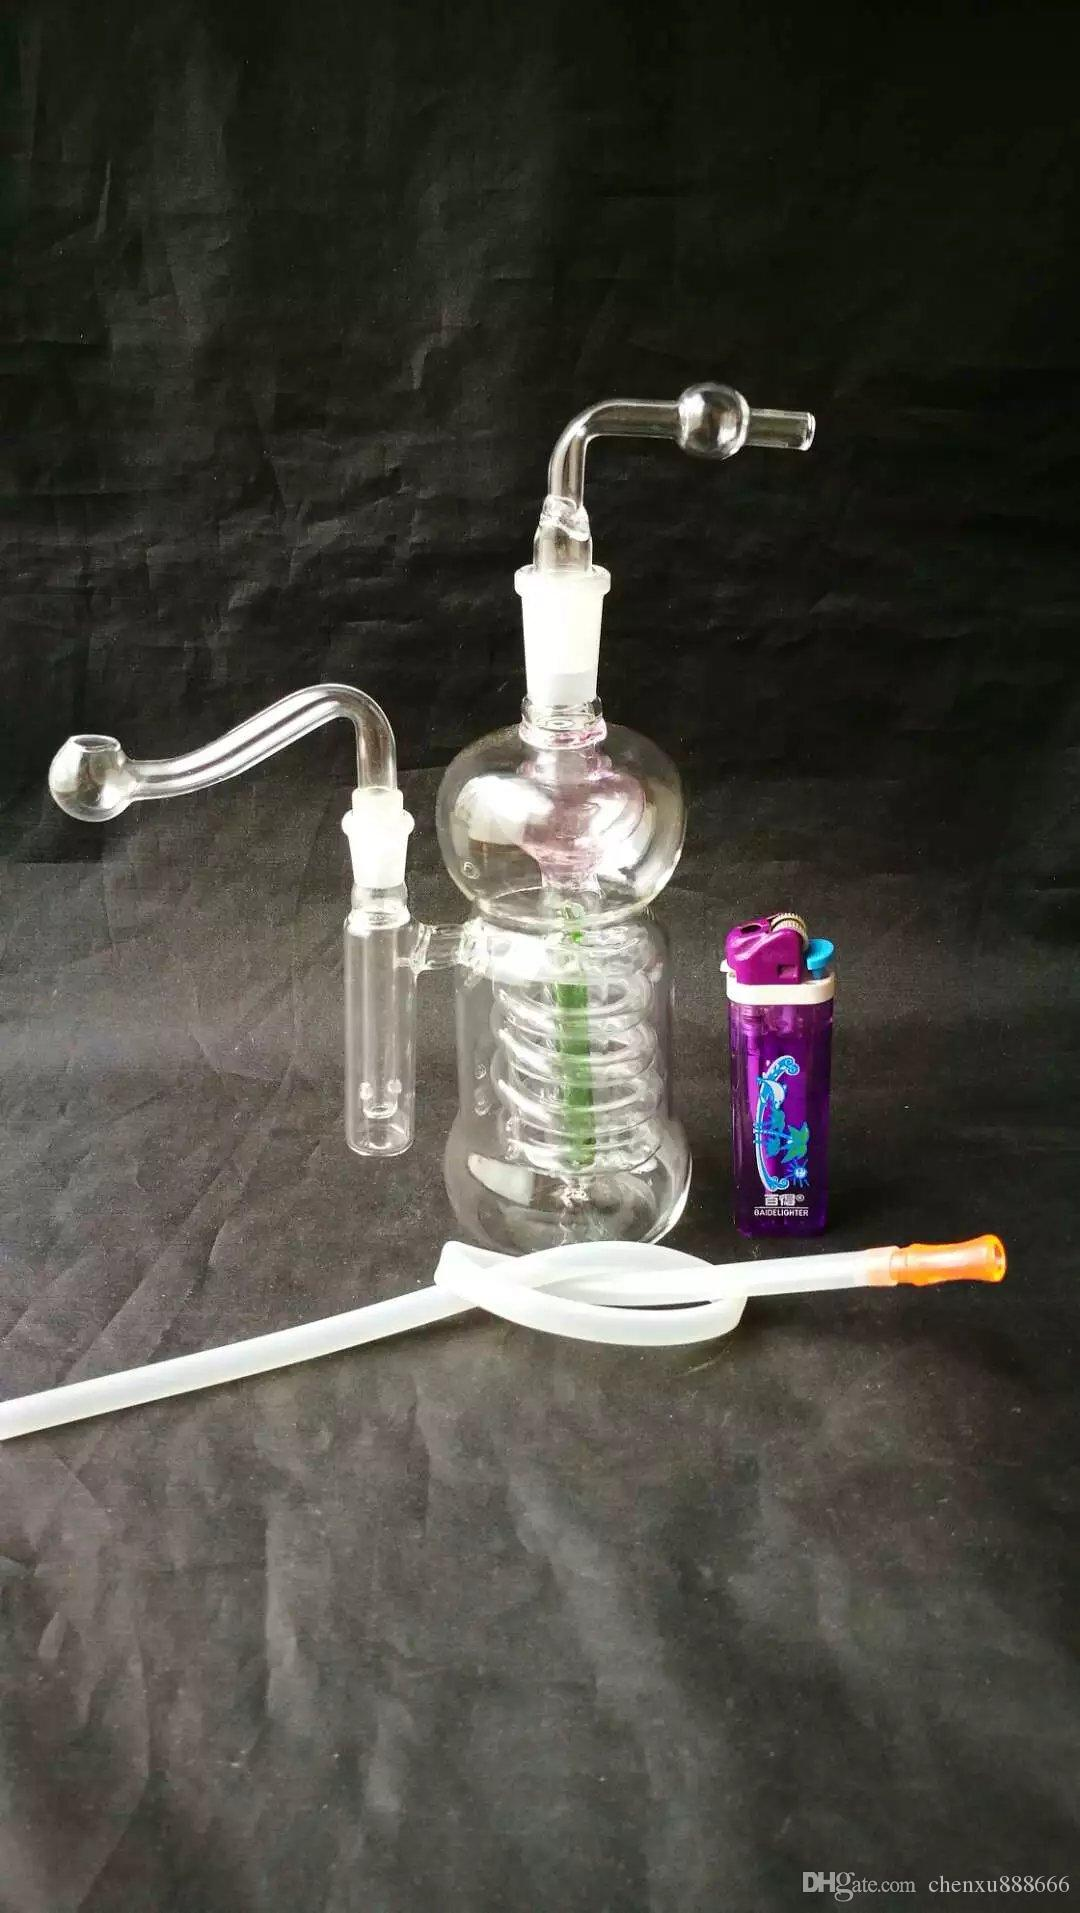 Spina zucca piatto narghilè di seta all'ingrosso di vetro narghilè, raccordi tubi di acqua di vetro, spedizione gratuita